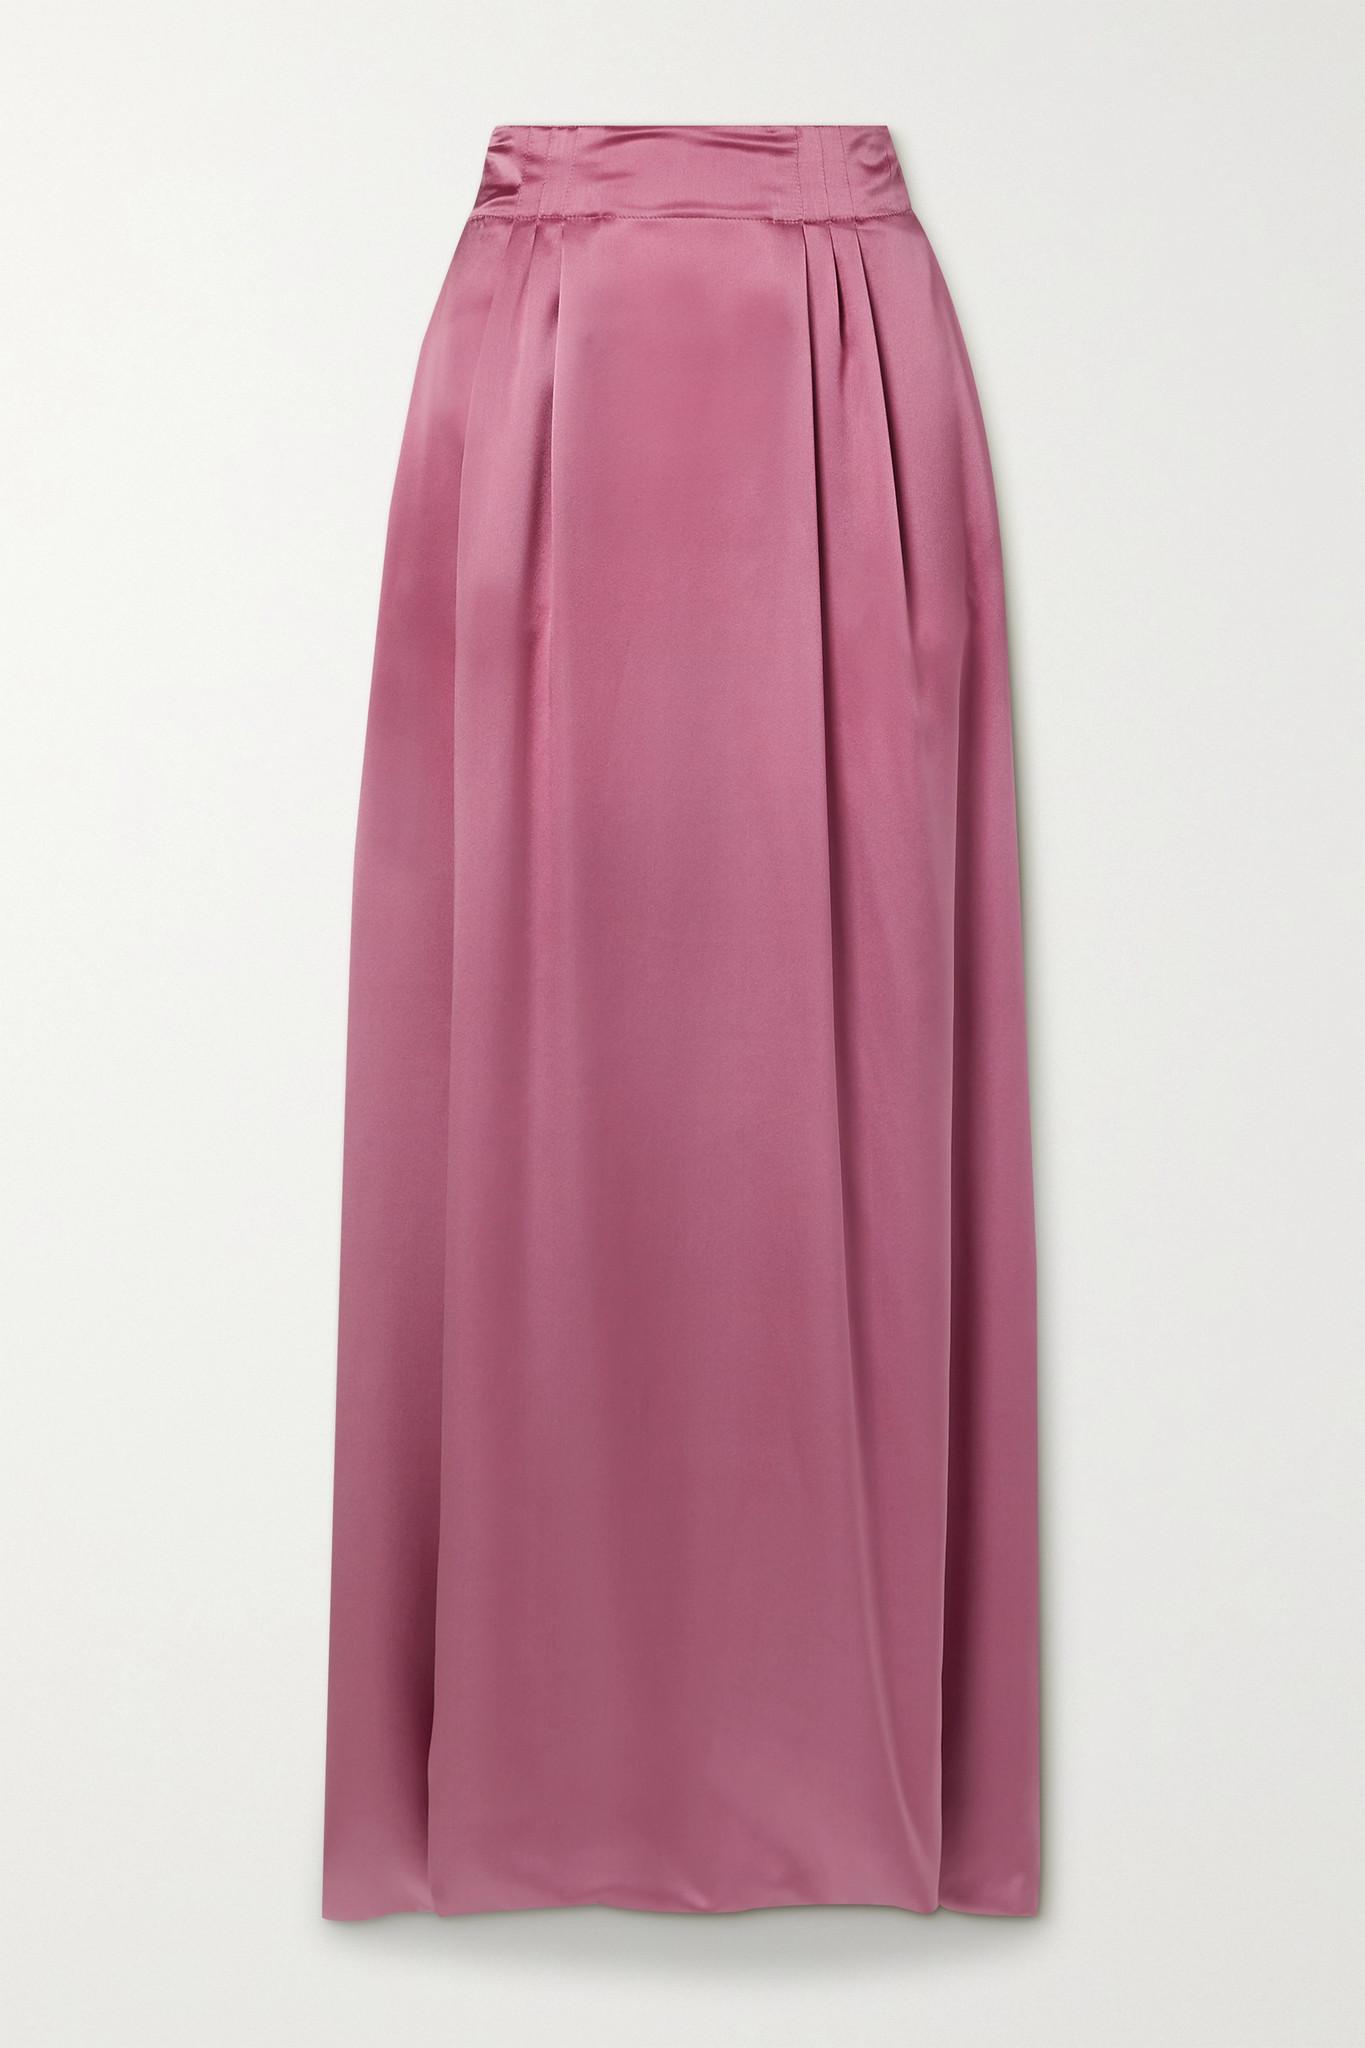 SALVATORE FERRAGAMO - 褶裥丝缎超长半身裙 - 粉红色 - IT42